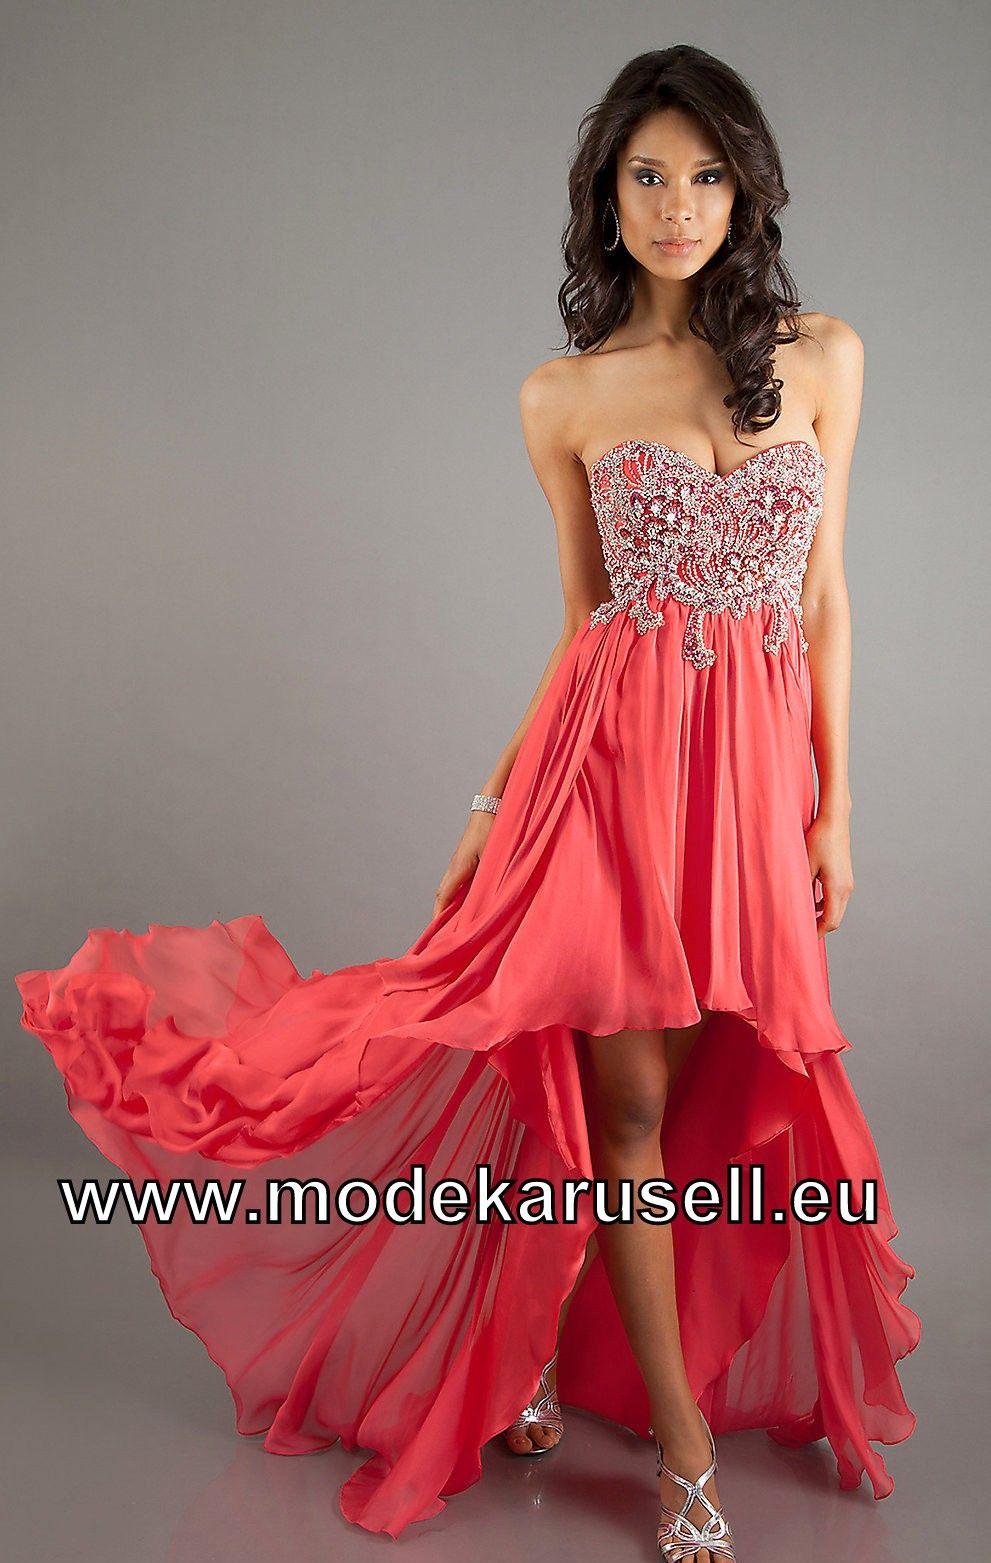 Himmlisches Vokuhilakleid Abendkleid in Erdbeer Rot | Princess ...